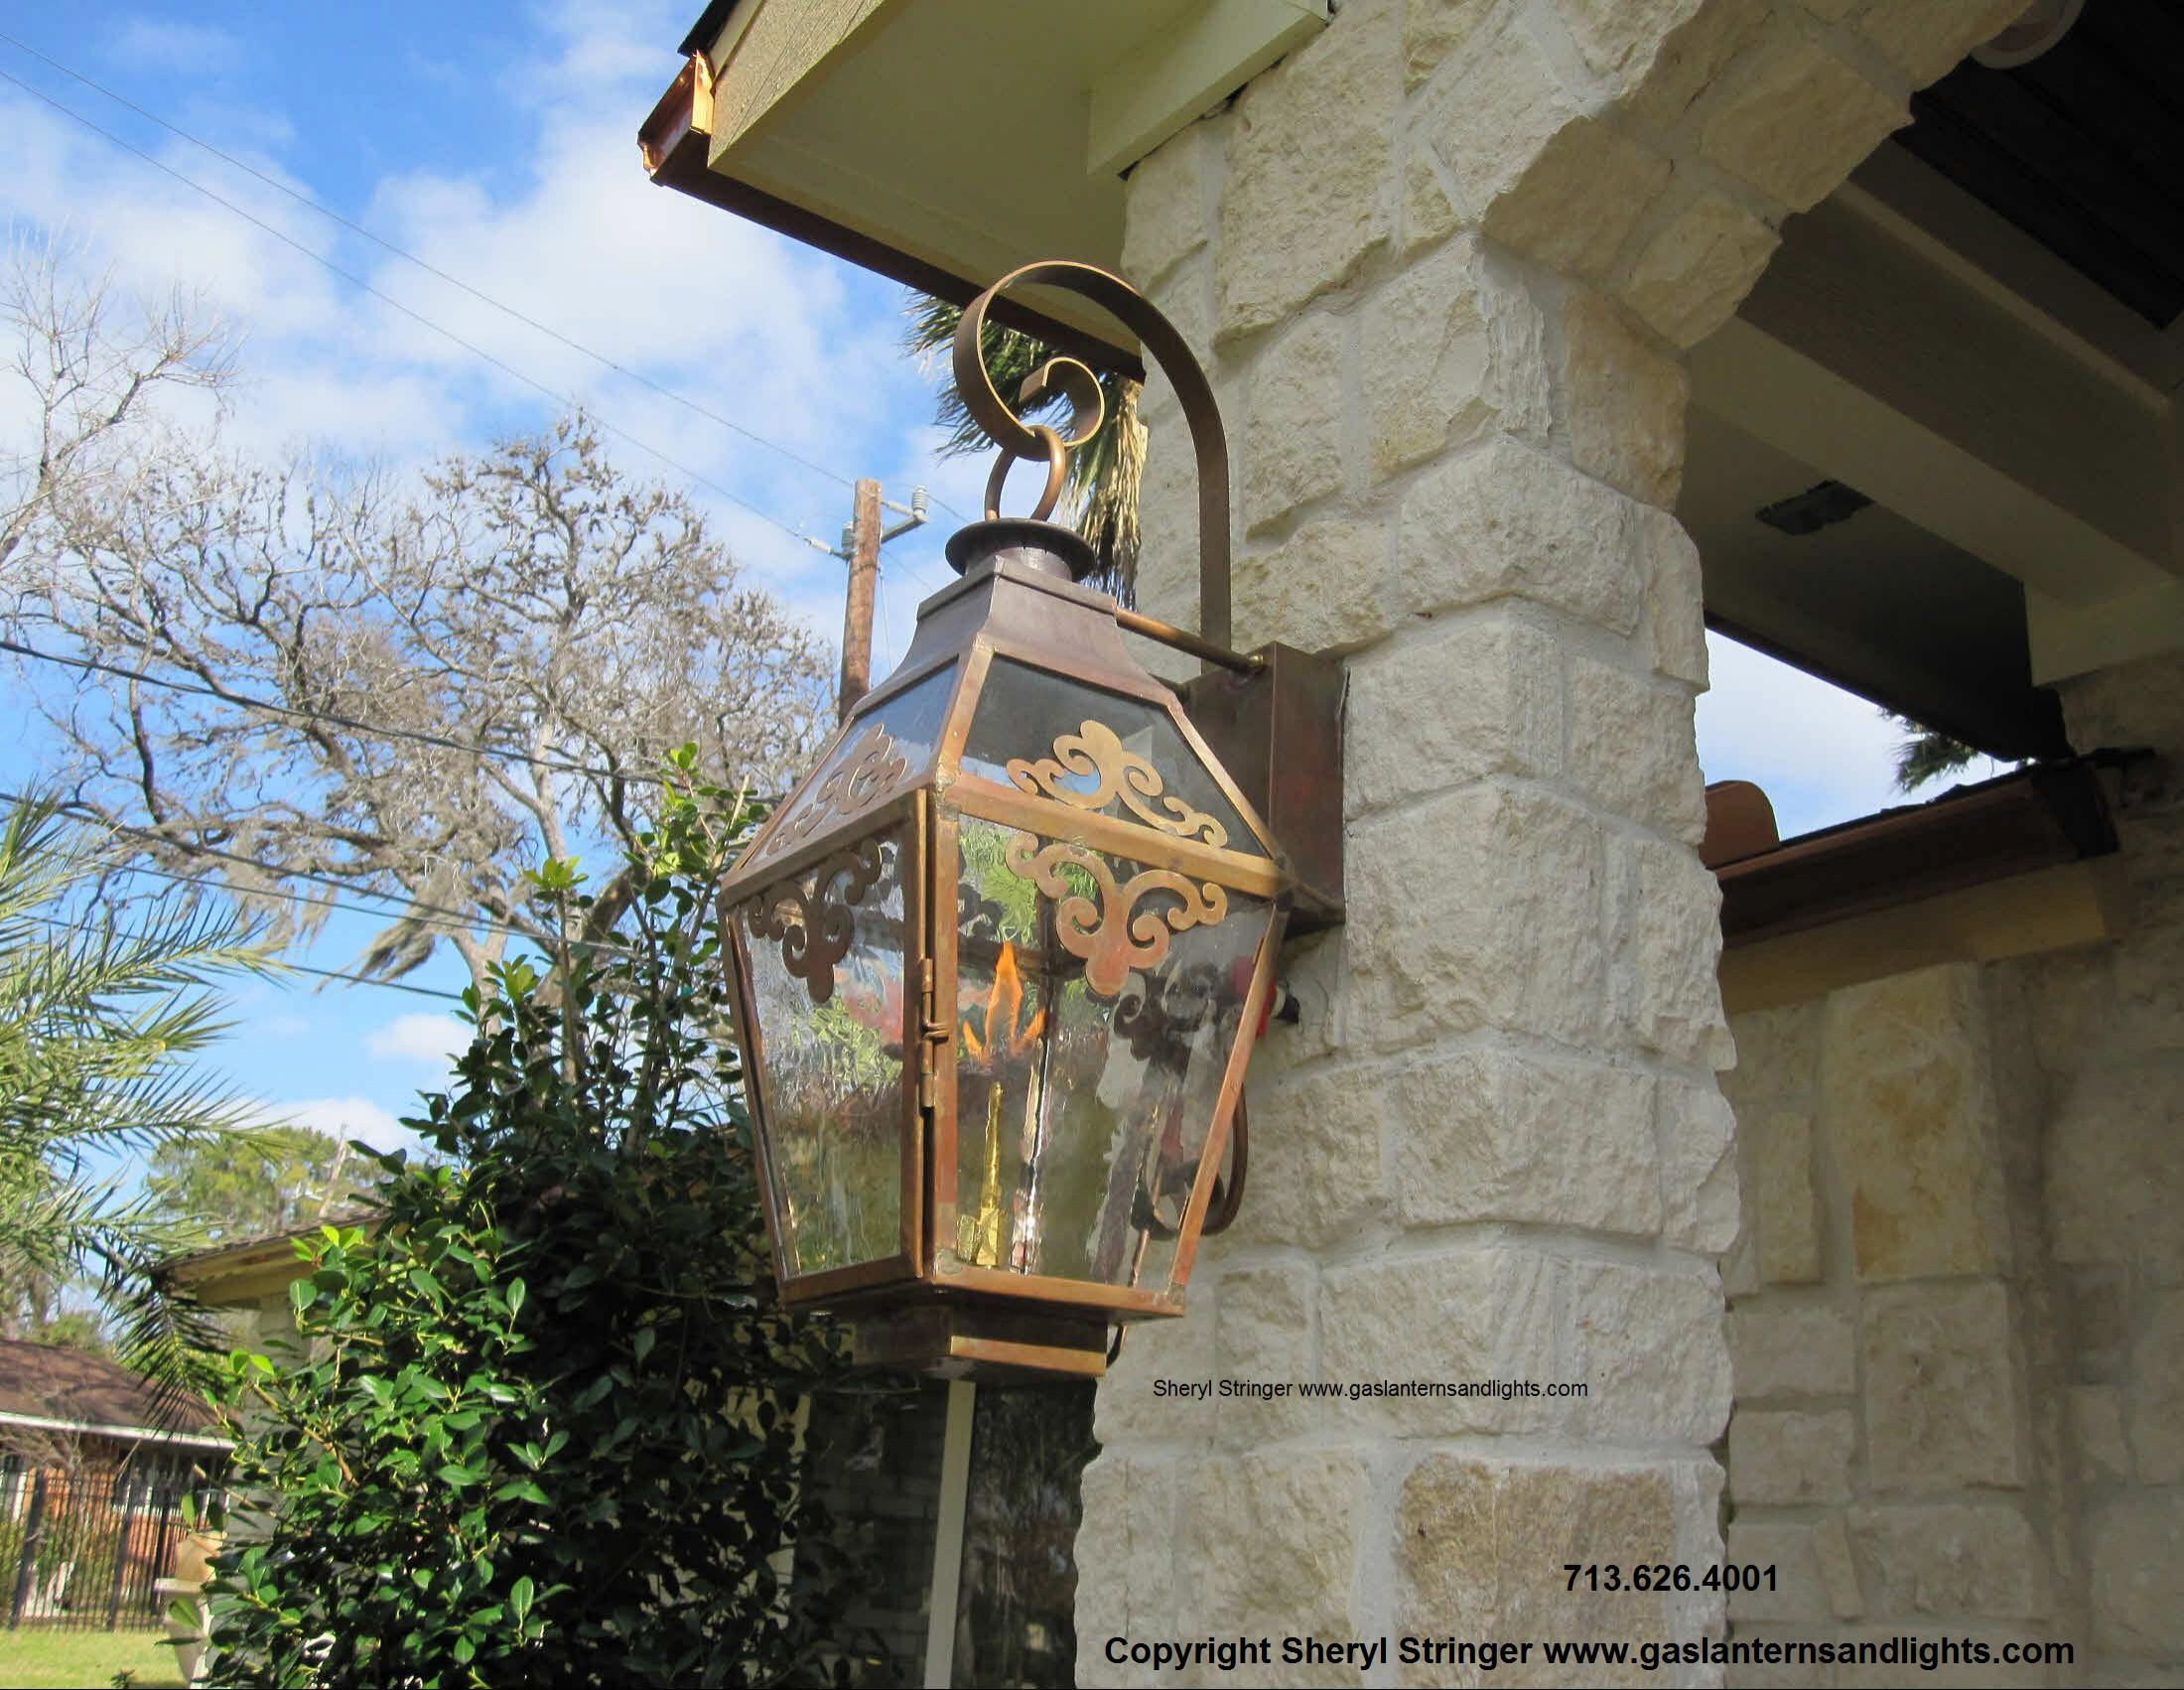 Sheryl's French Gas Lantern with Scrollwork